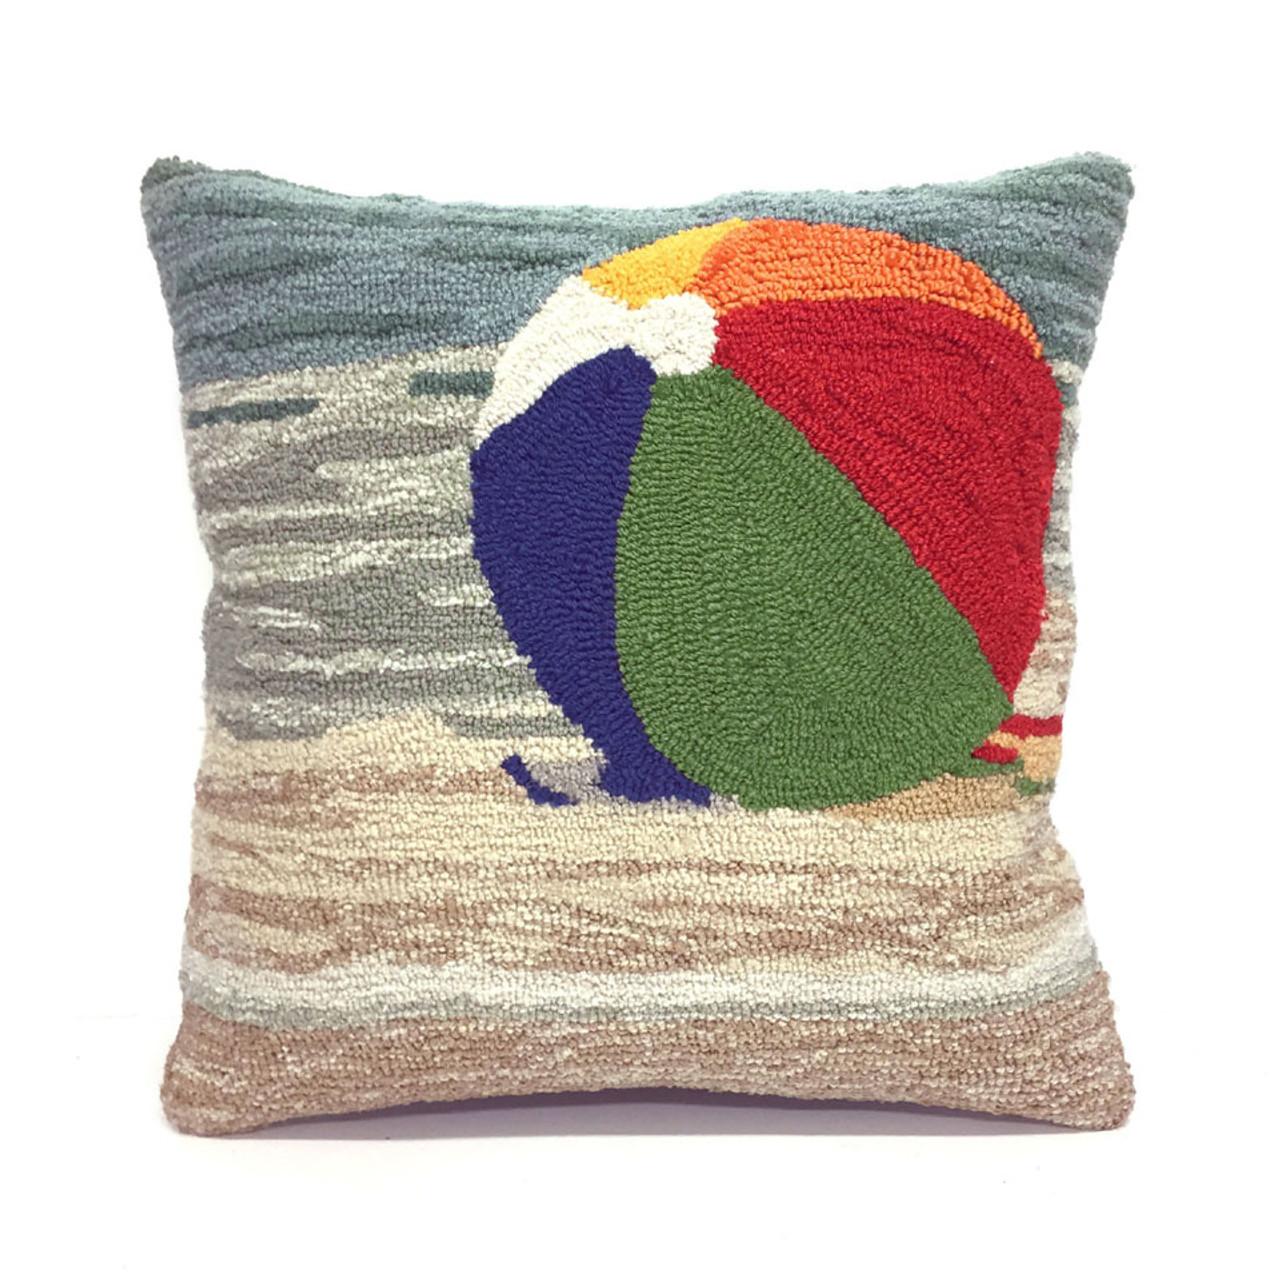 Frontporch Beach Ball Indoor/Outdoor Throw Pillow